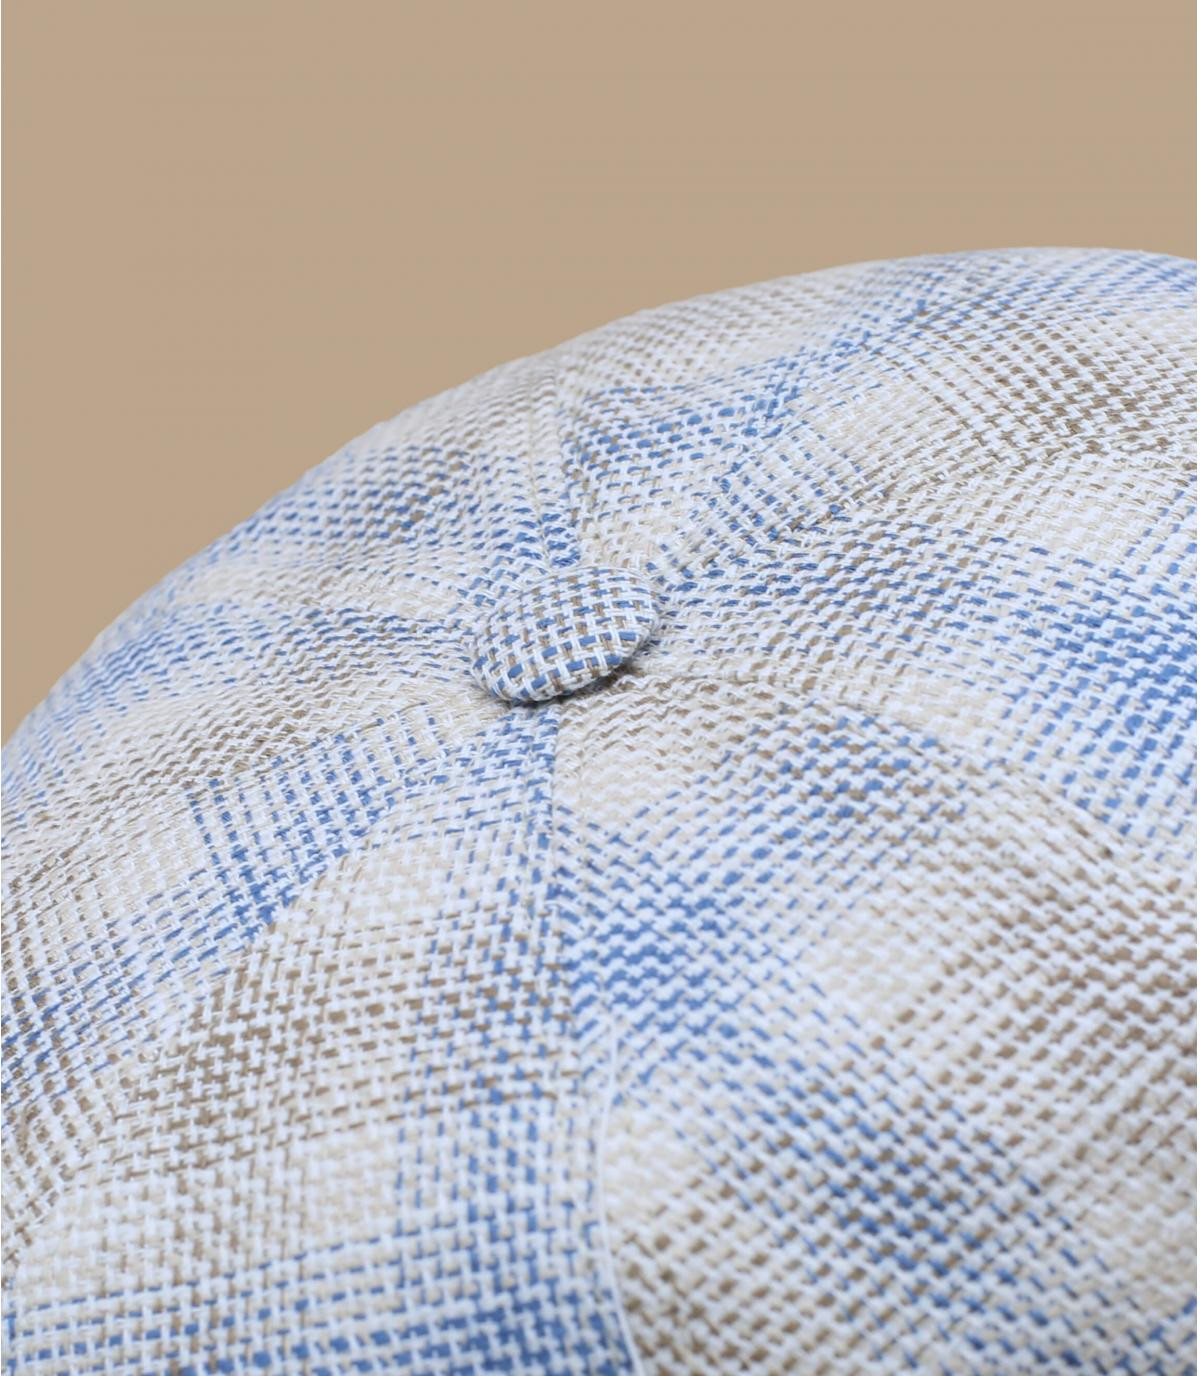 béret gavroche carreaux beige bleu